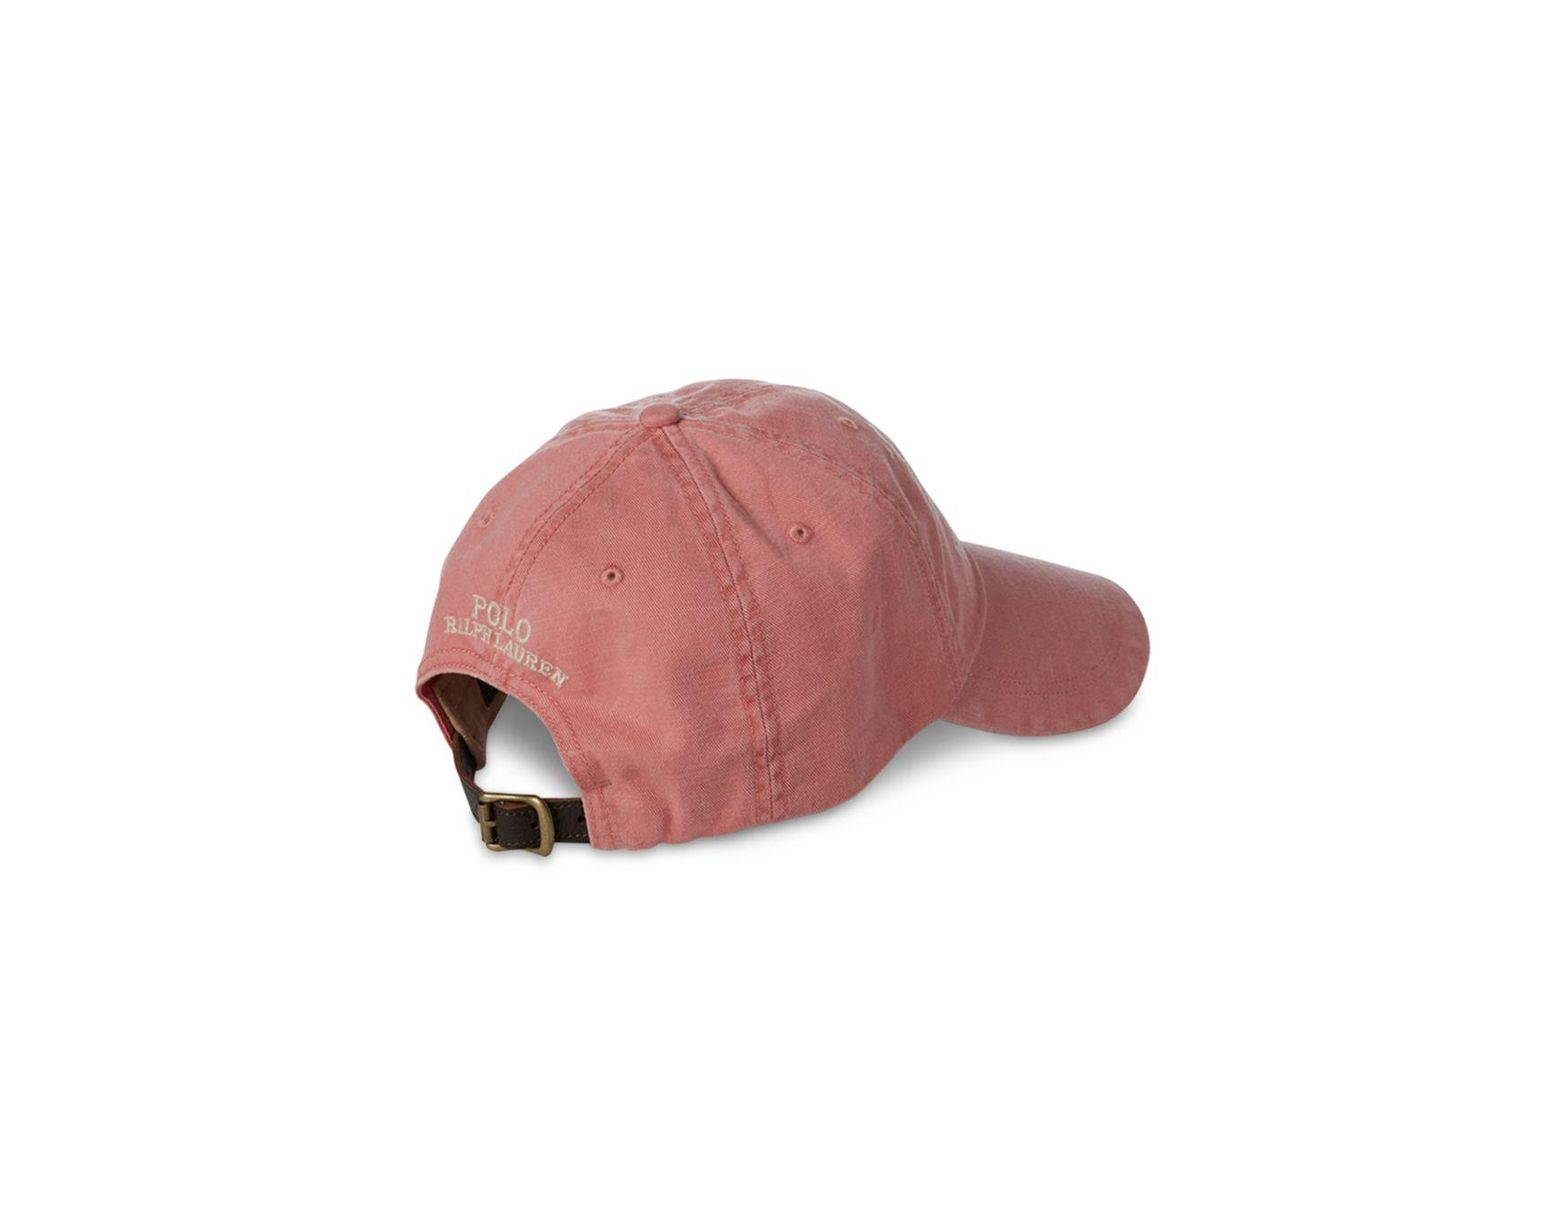 ecd5f76f Polo Ralph Lauren Marina Twill Cap in Red for Men - Lyst